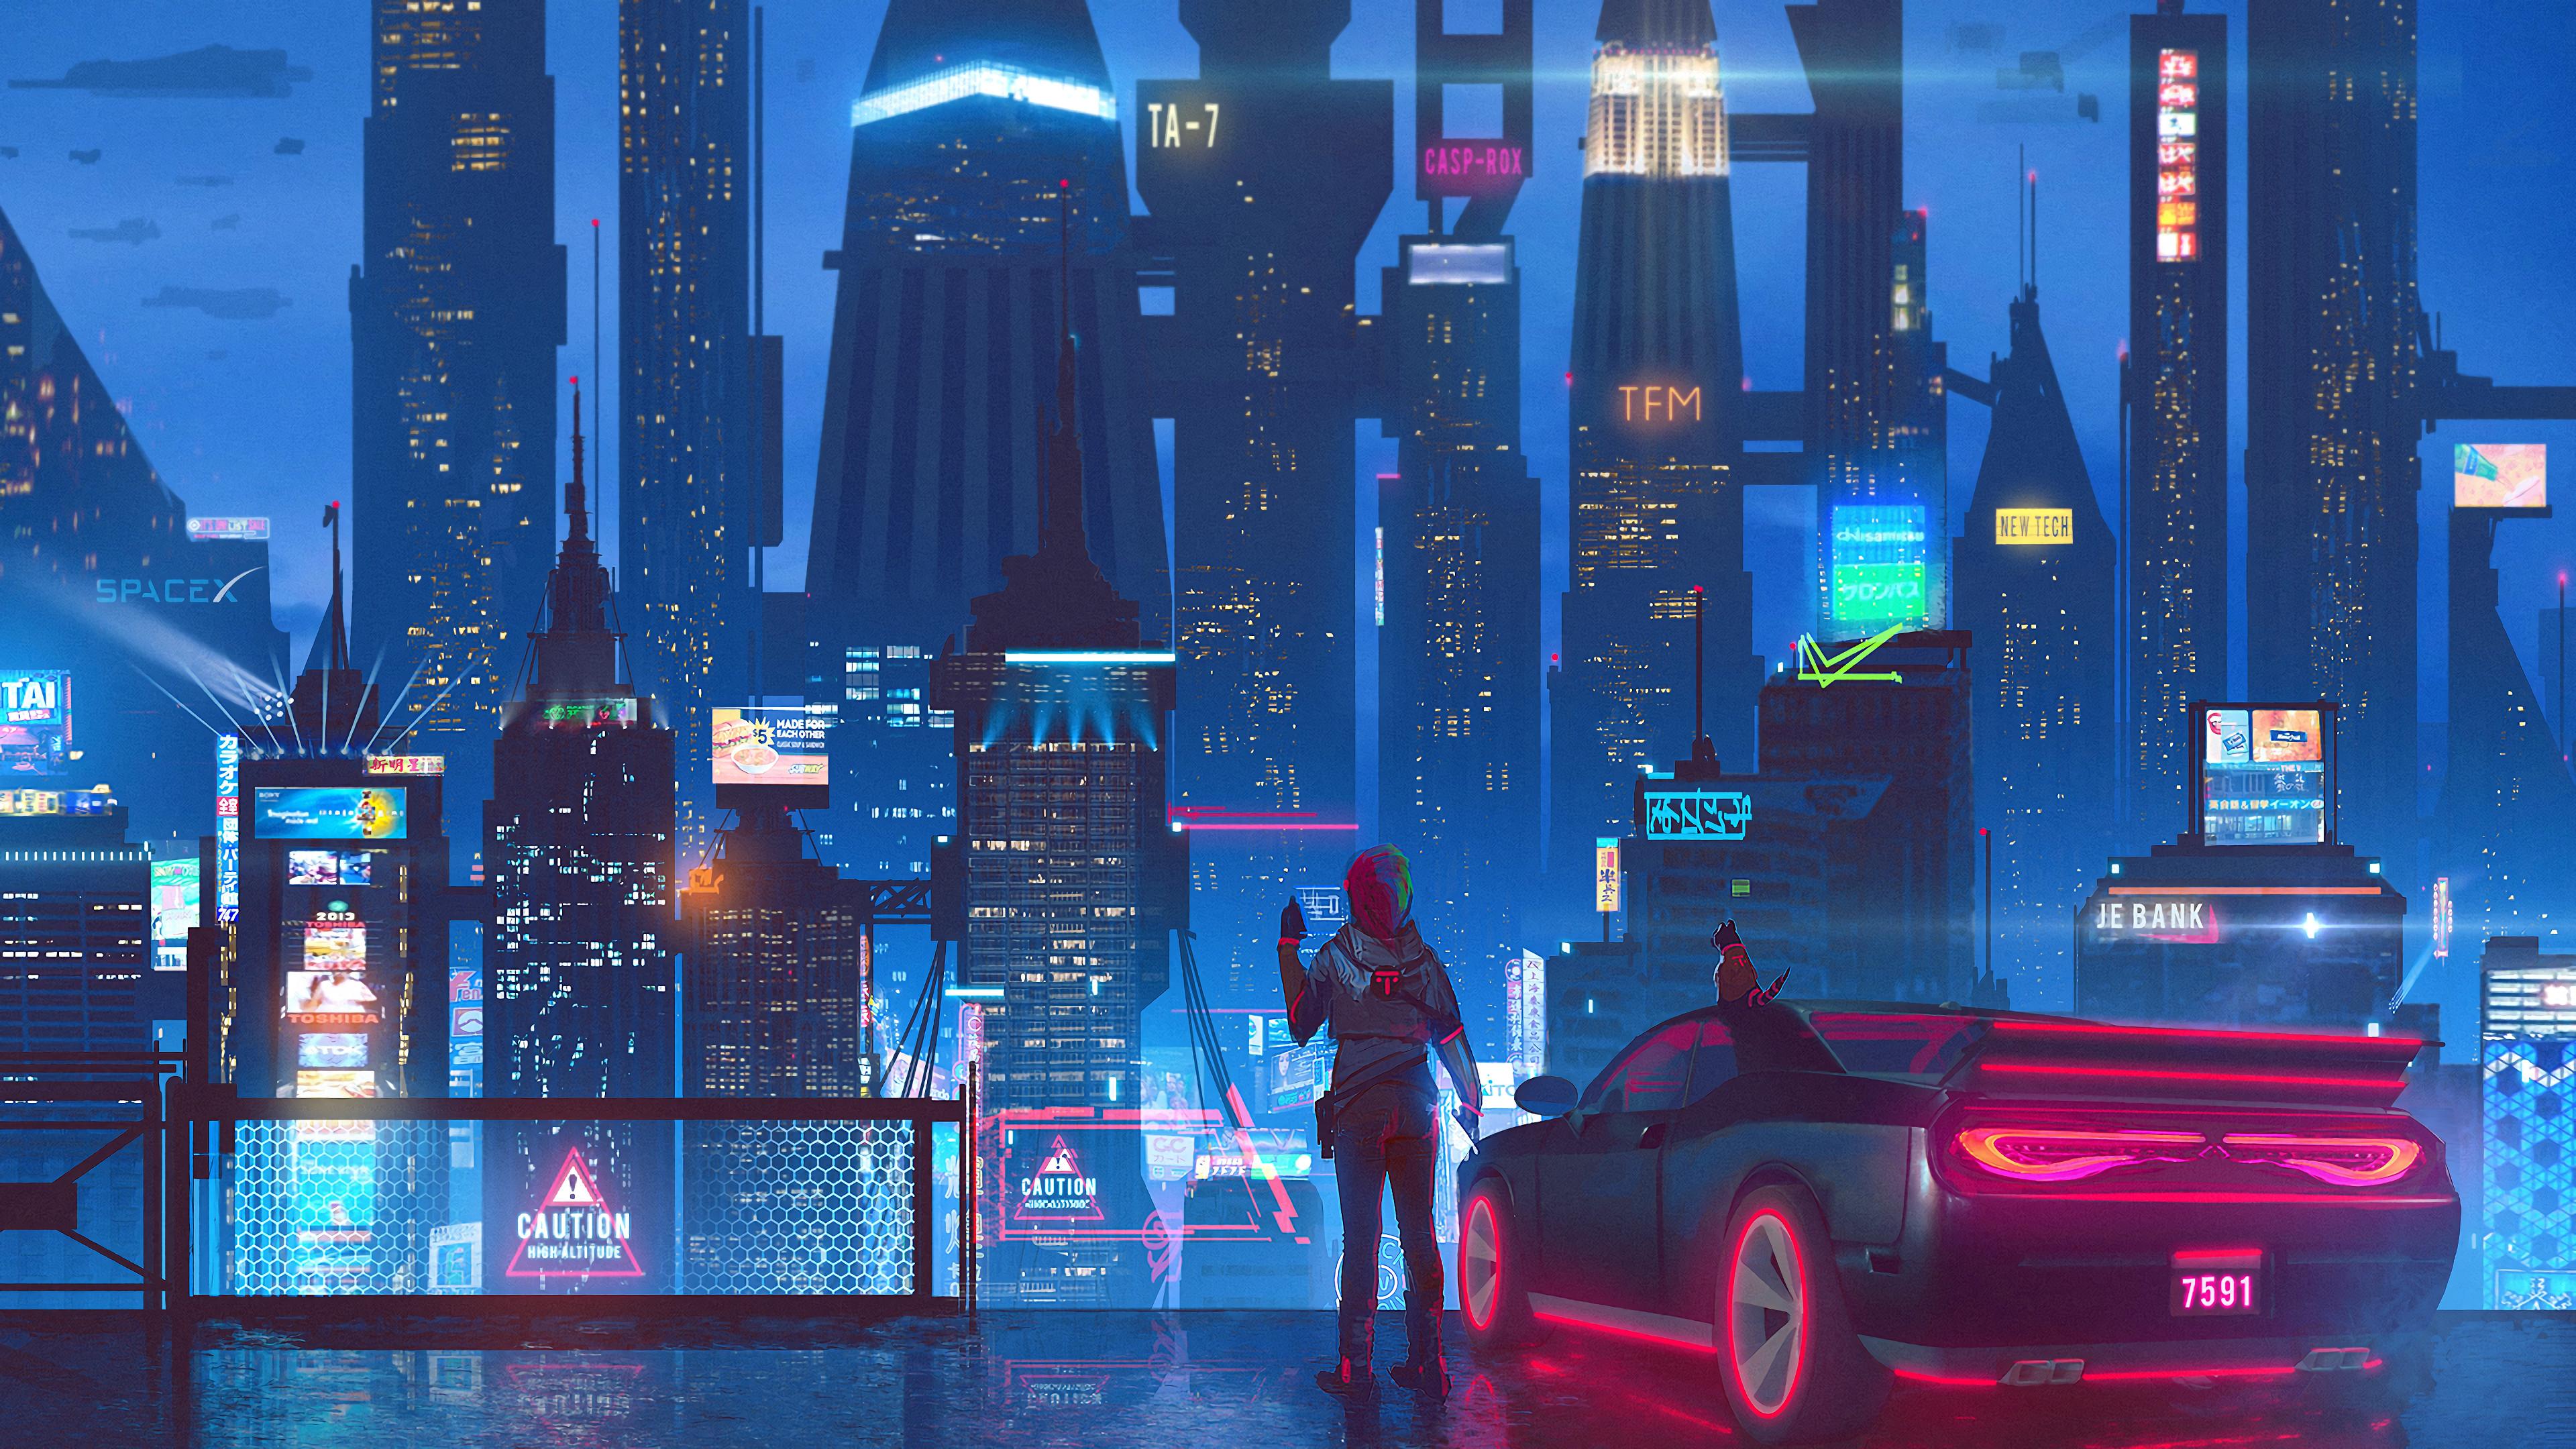 Sci-Fi, Cyberpunk, City, 4K, #108 Wallpaper